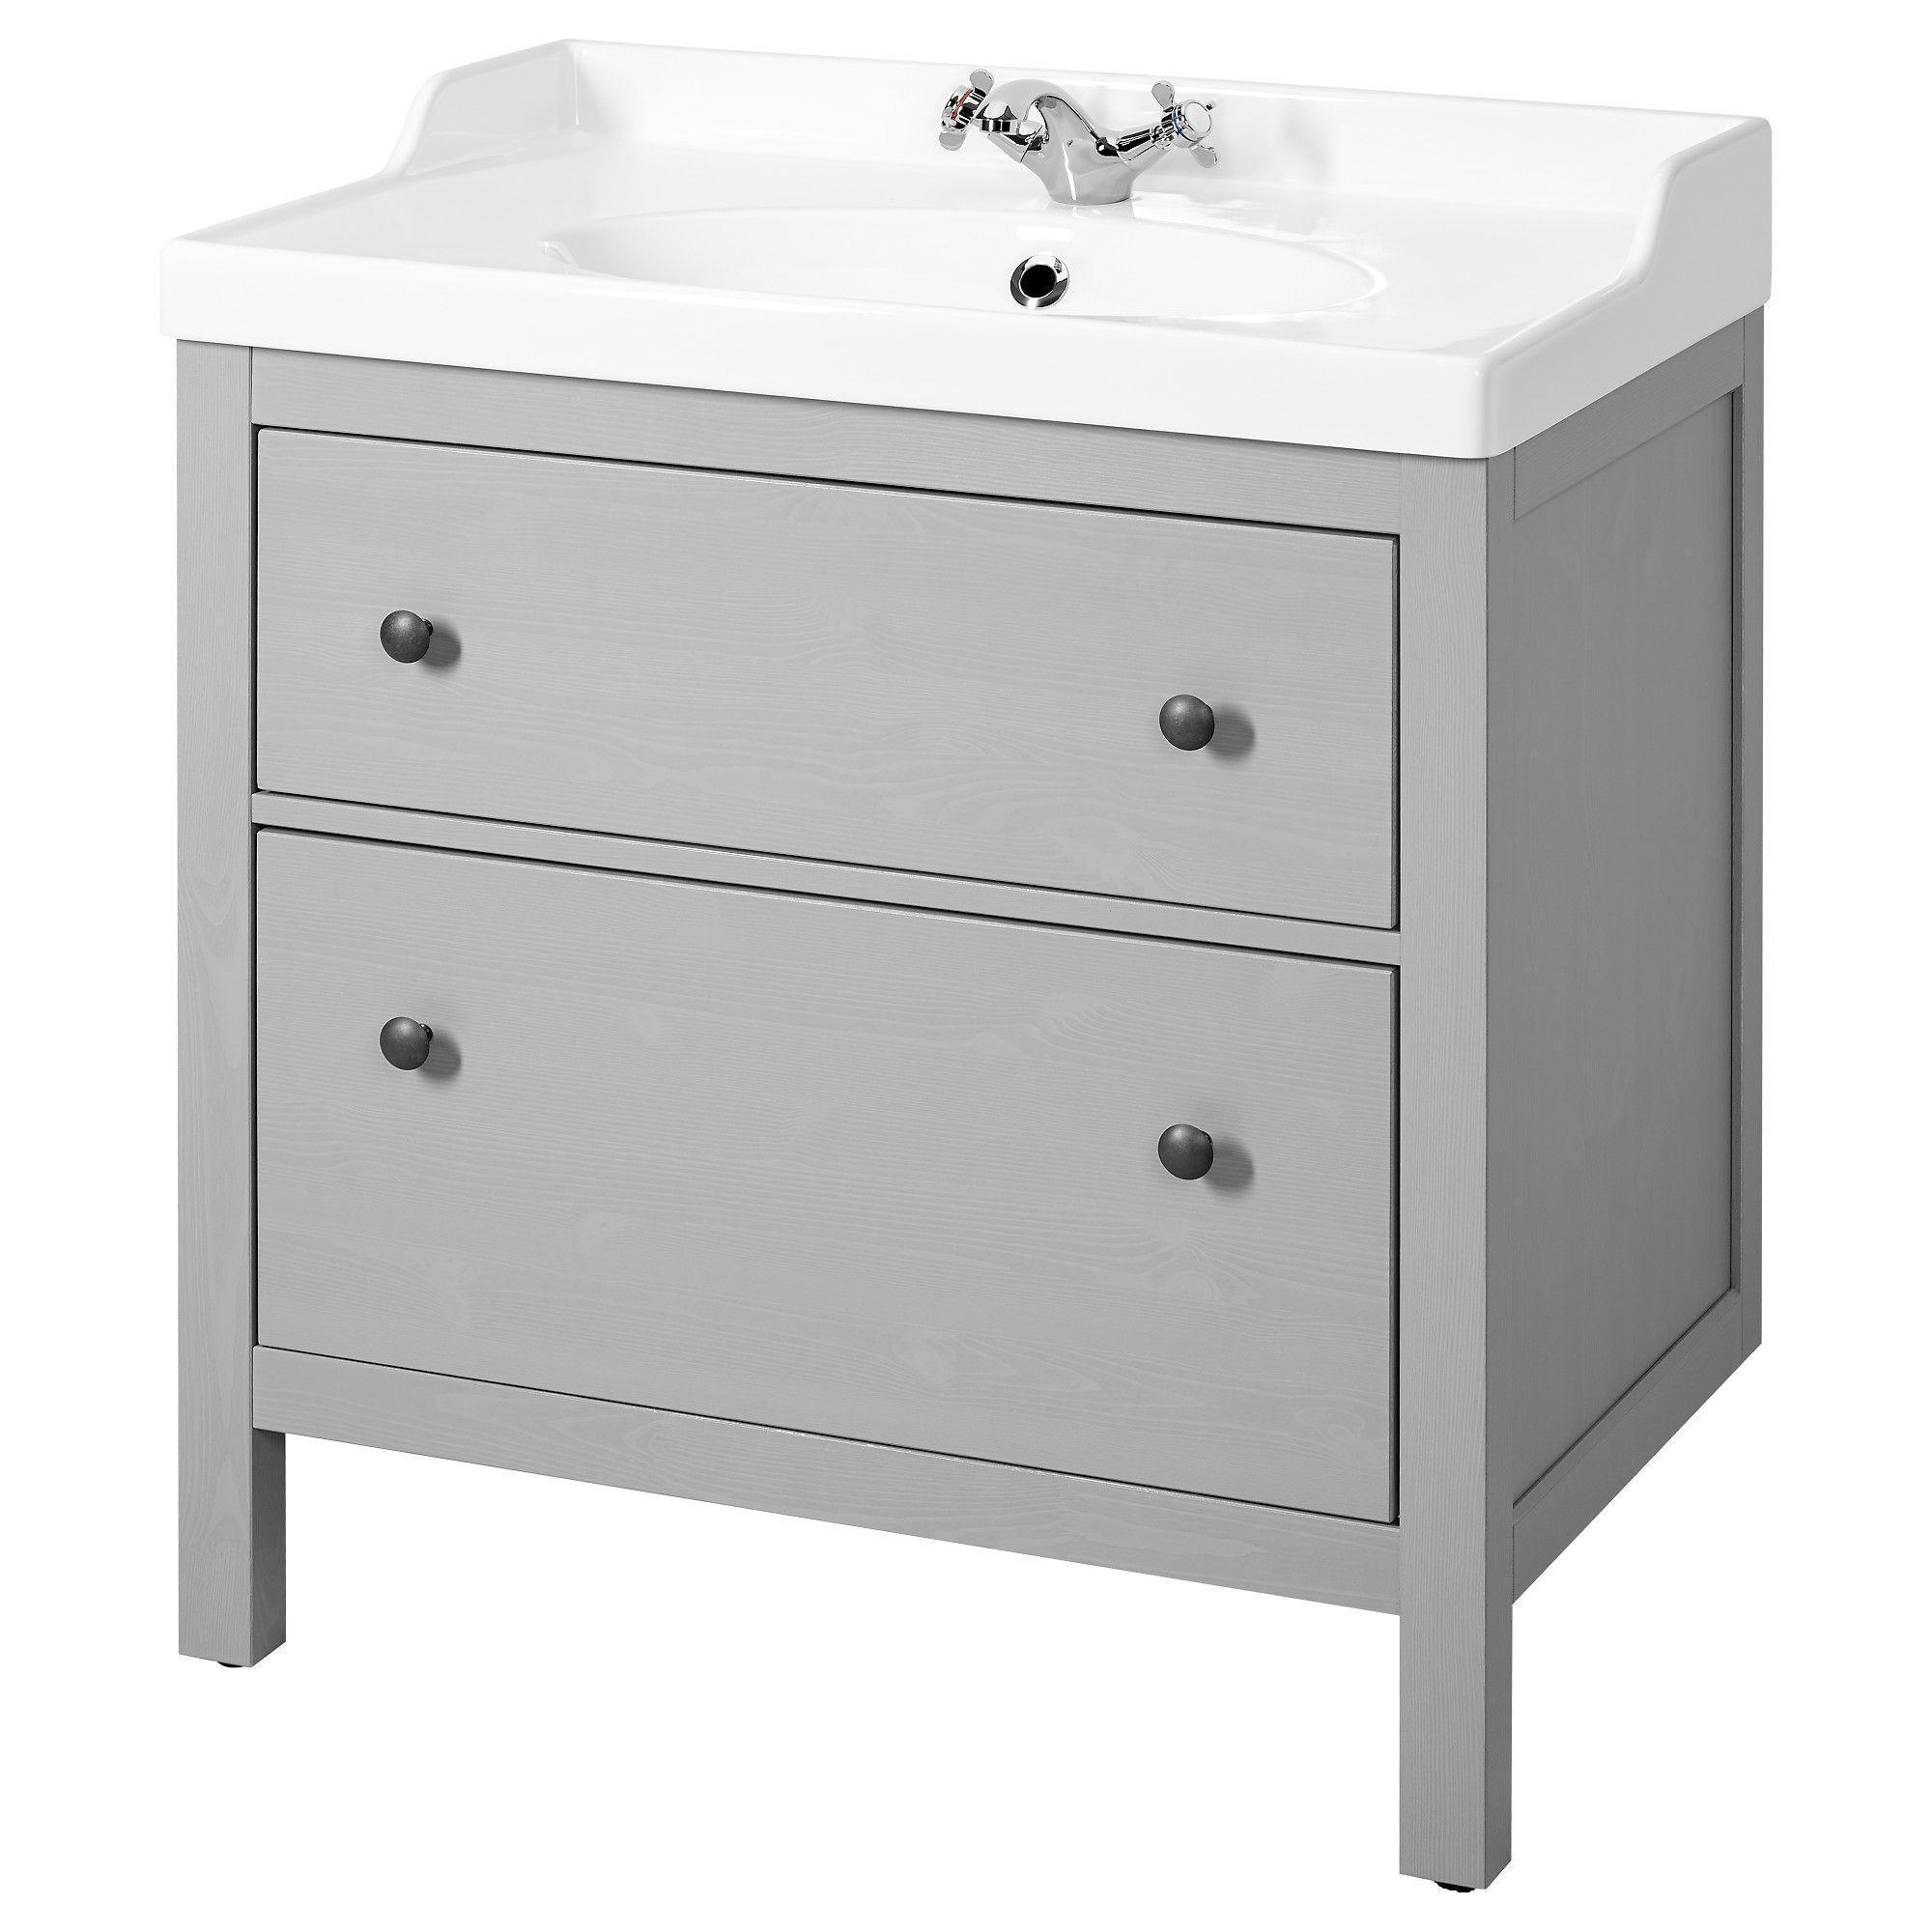 Pin By Ladendirekt On Badmobel Bathroom Sink Cabinets Ikea Bathroom Vanity Hemnes